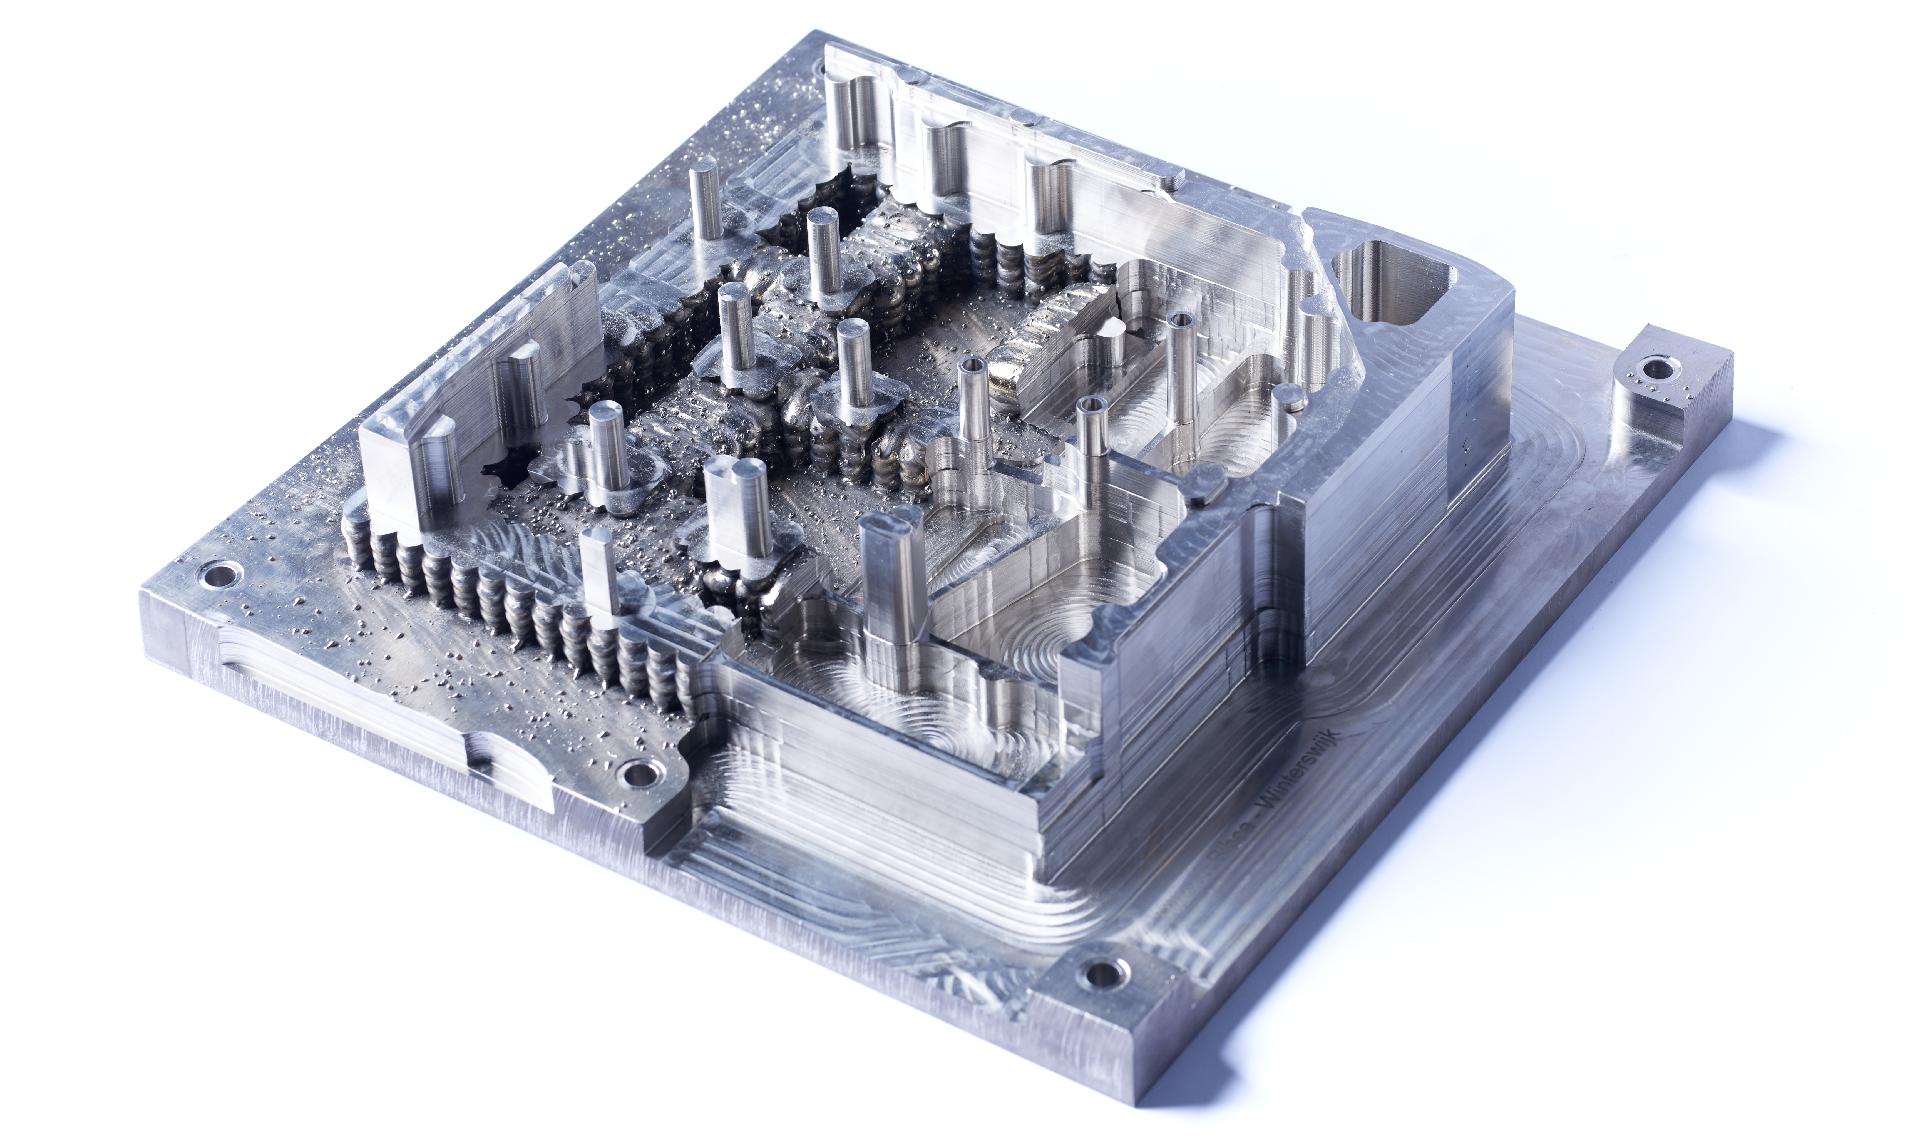 Waam printed titanium